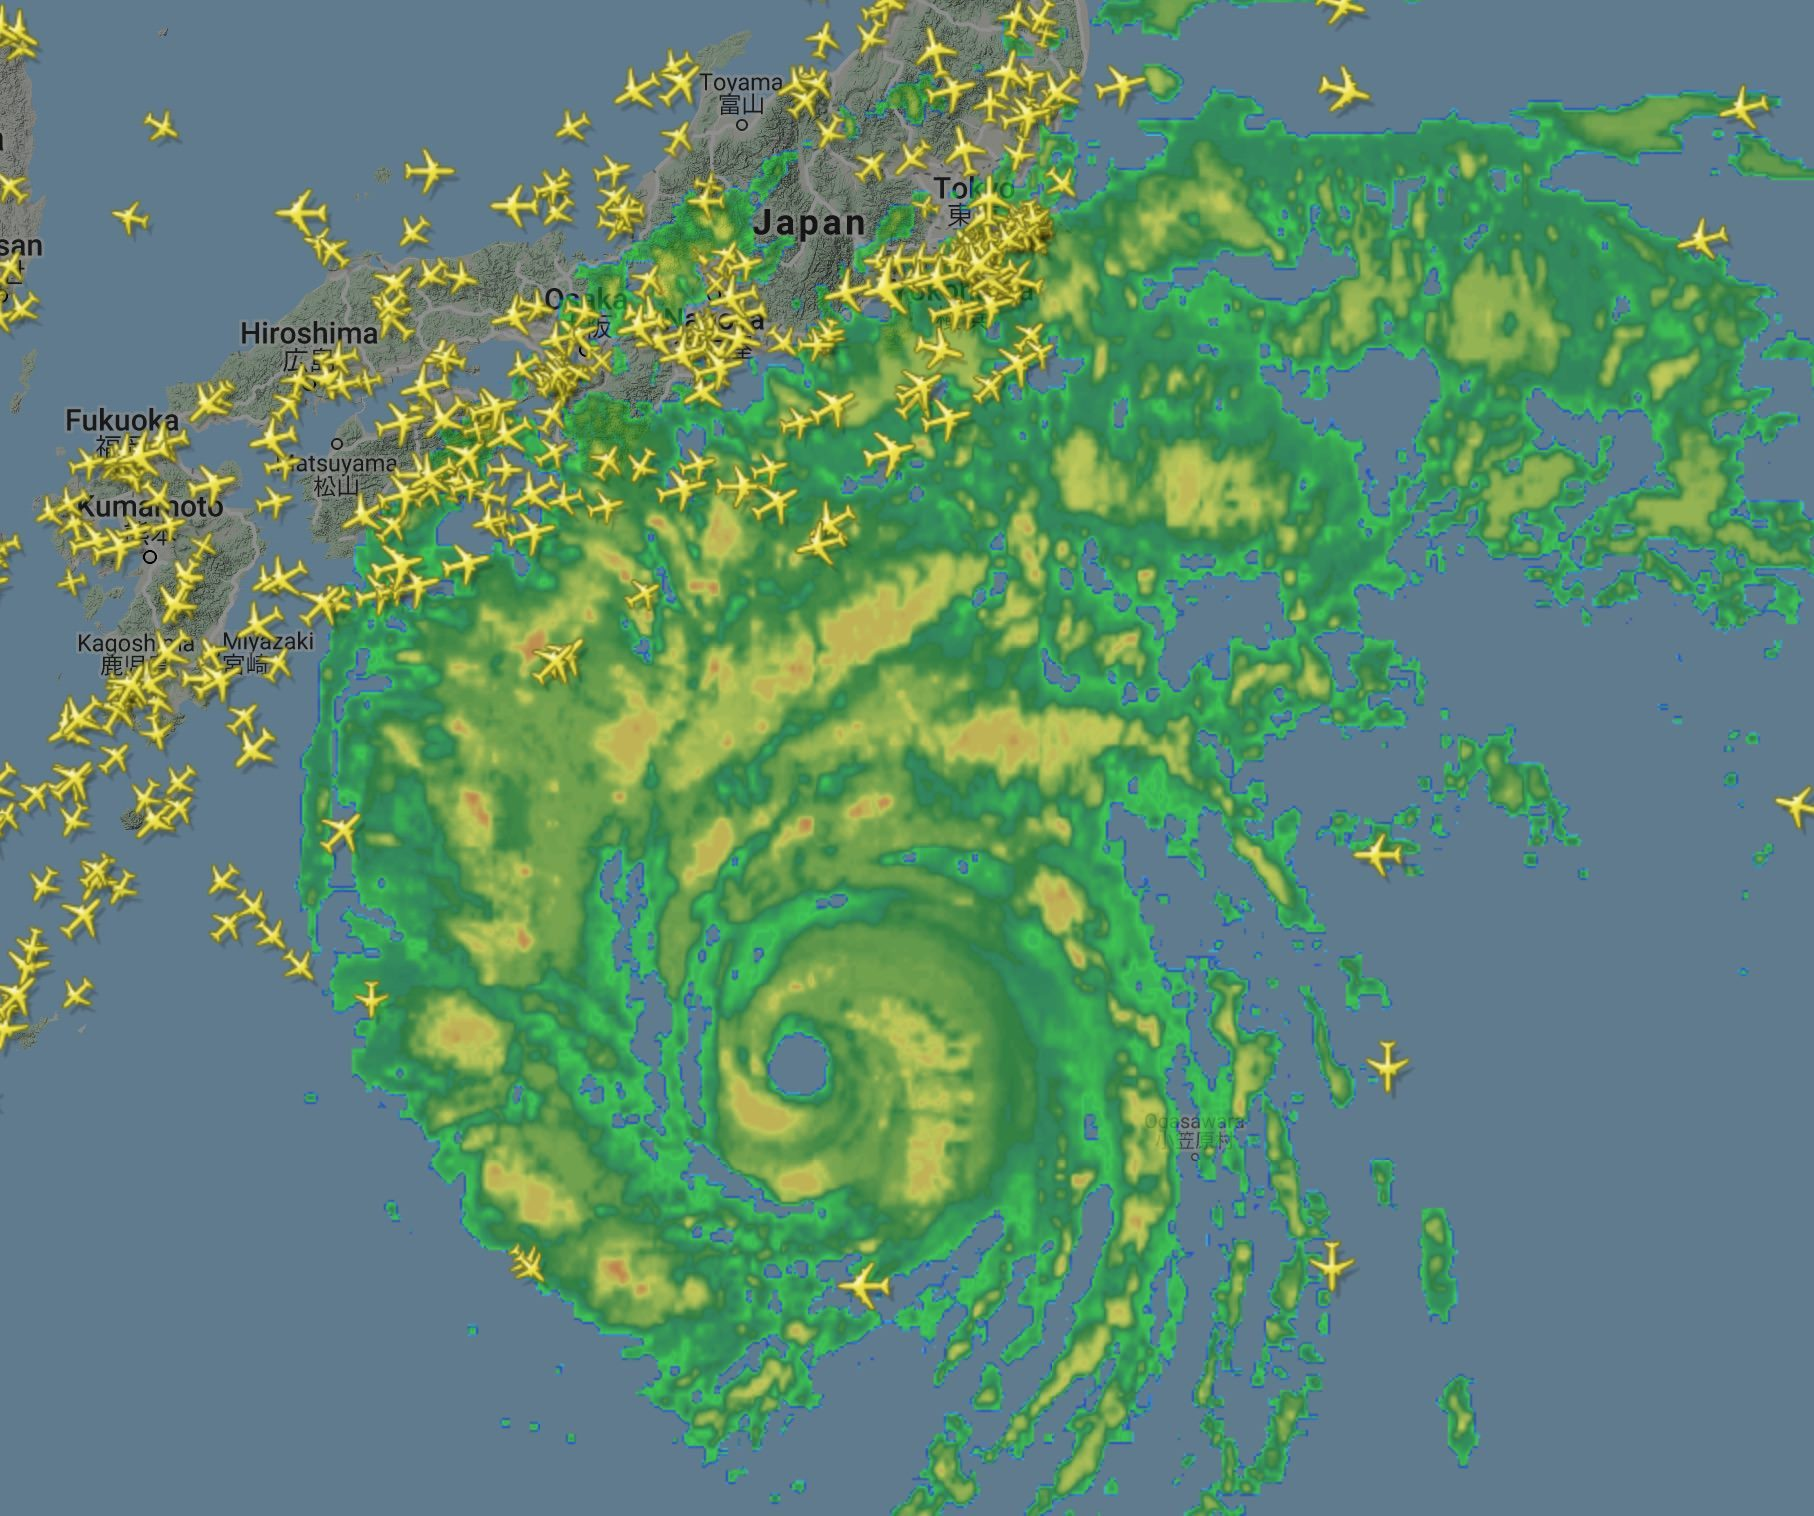 Super Typhoon Hagabis approaching Japan